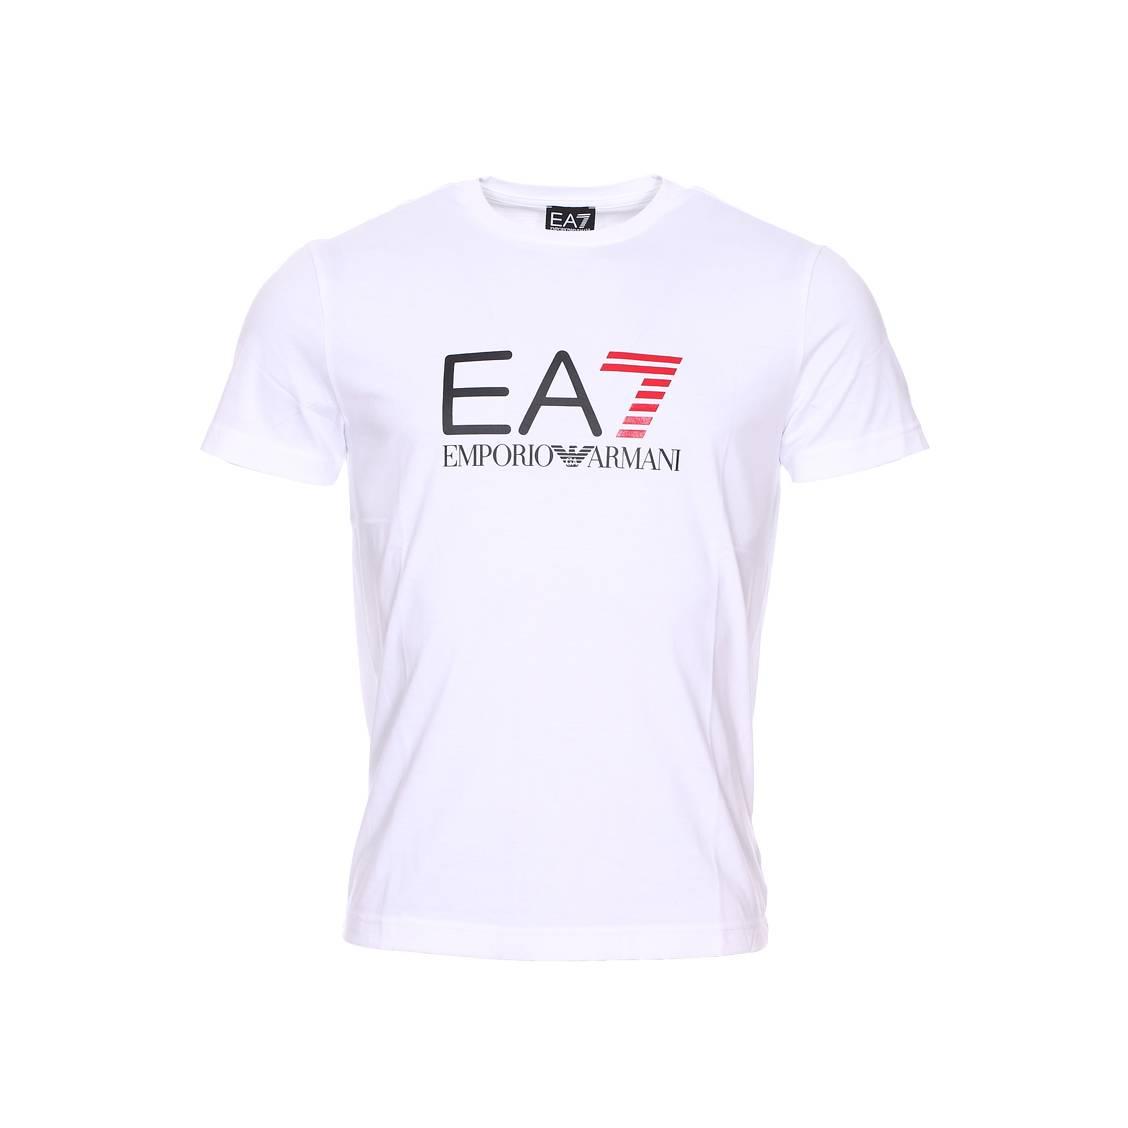 tee shirt col rond ea7 en coton blanc floqu du logo en noir et rouge rue des hommes. Black Bedroom Furniture Sets. Home Design Ideas